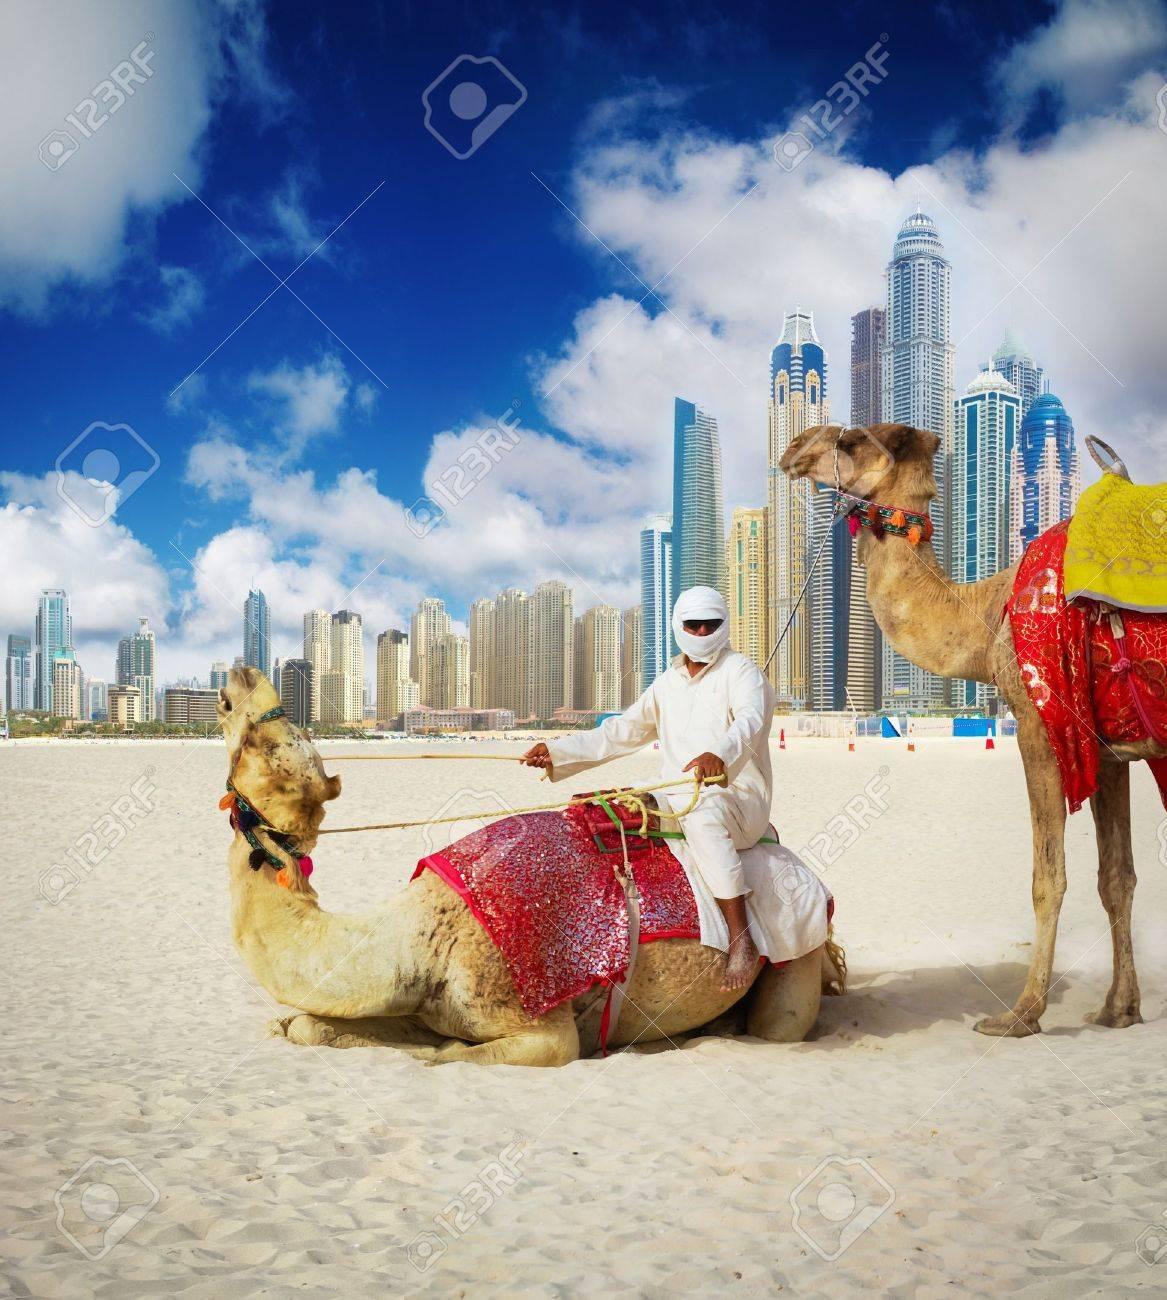 Camel on dubai beach united arab emirates stock photo picture camel on dubai beach united arab emirates stock photo 15194426 thecheapjerseys Images